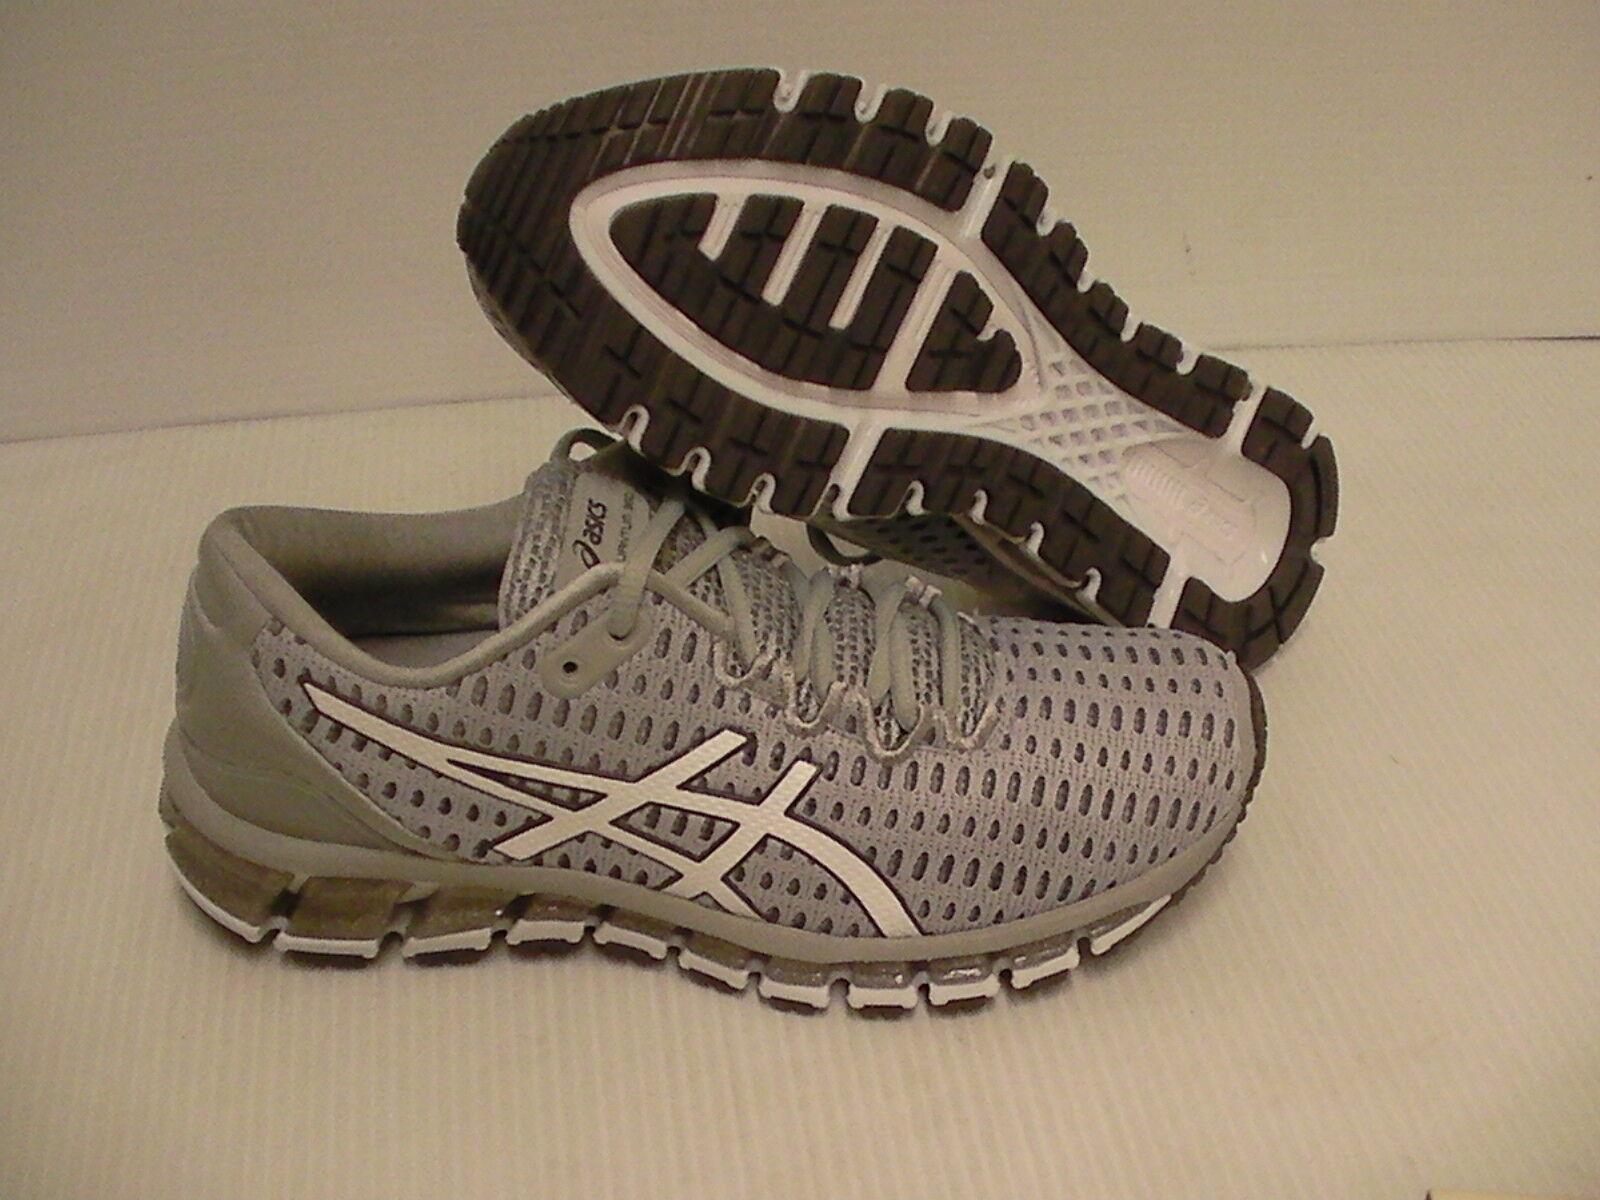 ASICS GEL 360 mujeres Quantum Shift Mid Gris 6.5 running Zapatos SIZE 6.5 Gris nosotros marca de descuento b92afe